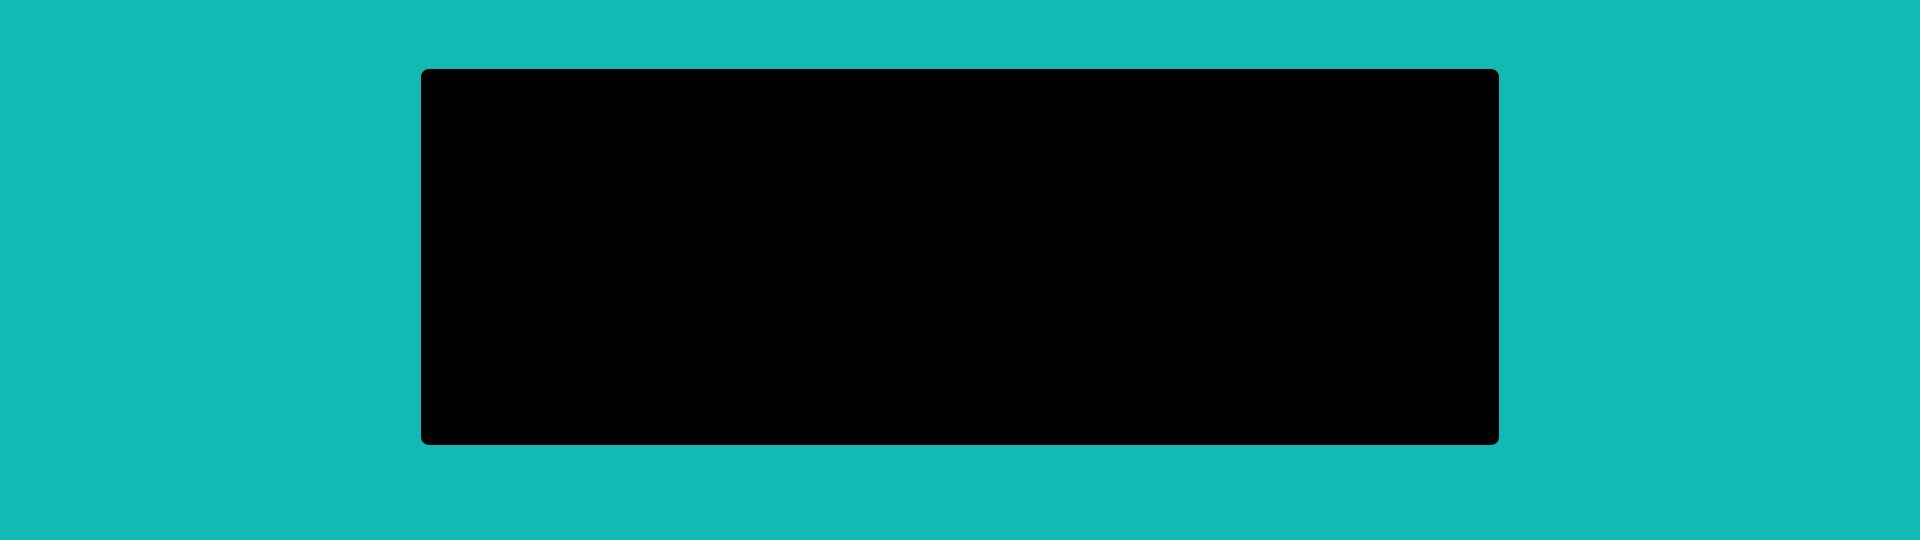 CATEGORY-OTO-KISINDIRIMILASTIKLERDE10GENEL-23-02